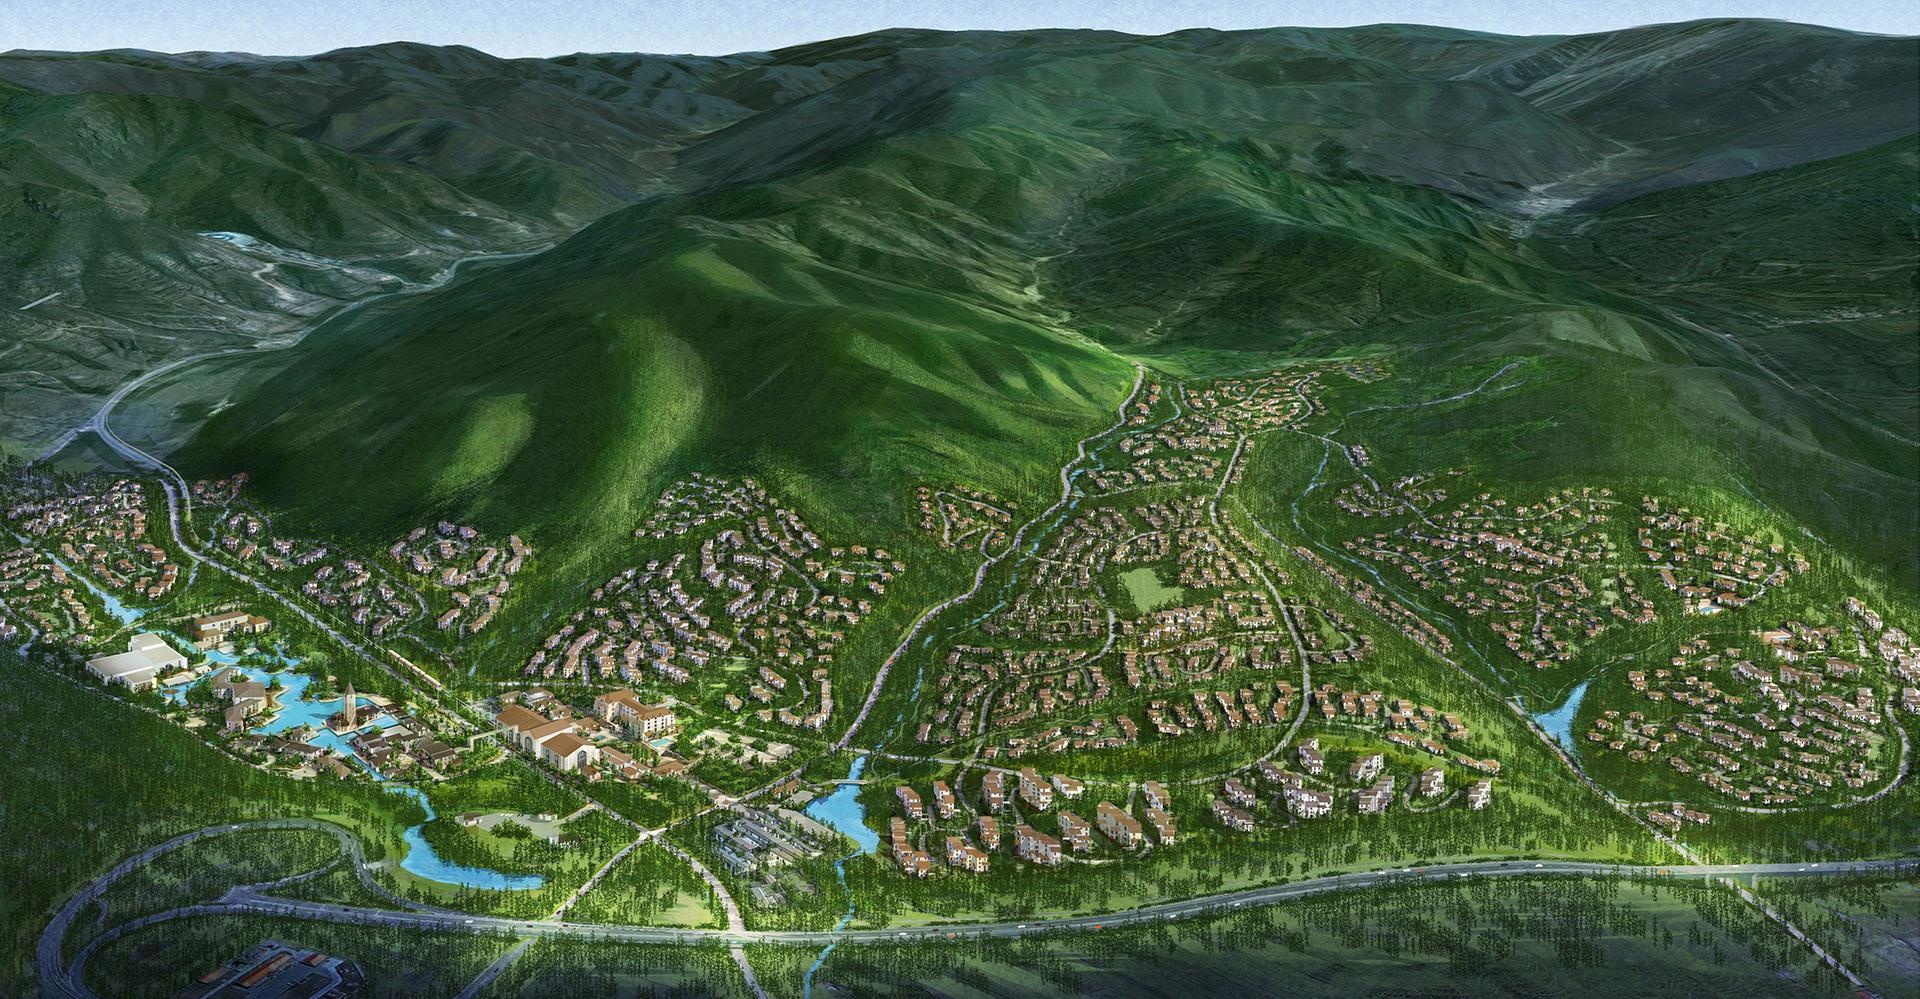 Chongli Ski and Mountain Resort WATG Resort Town Aerial